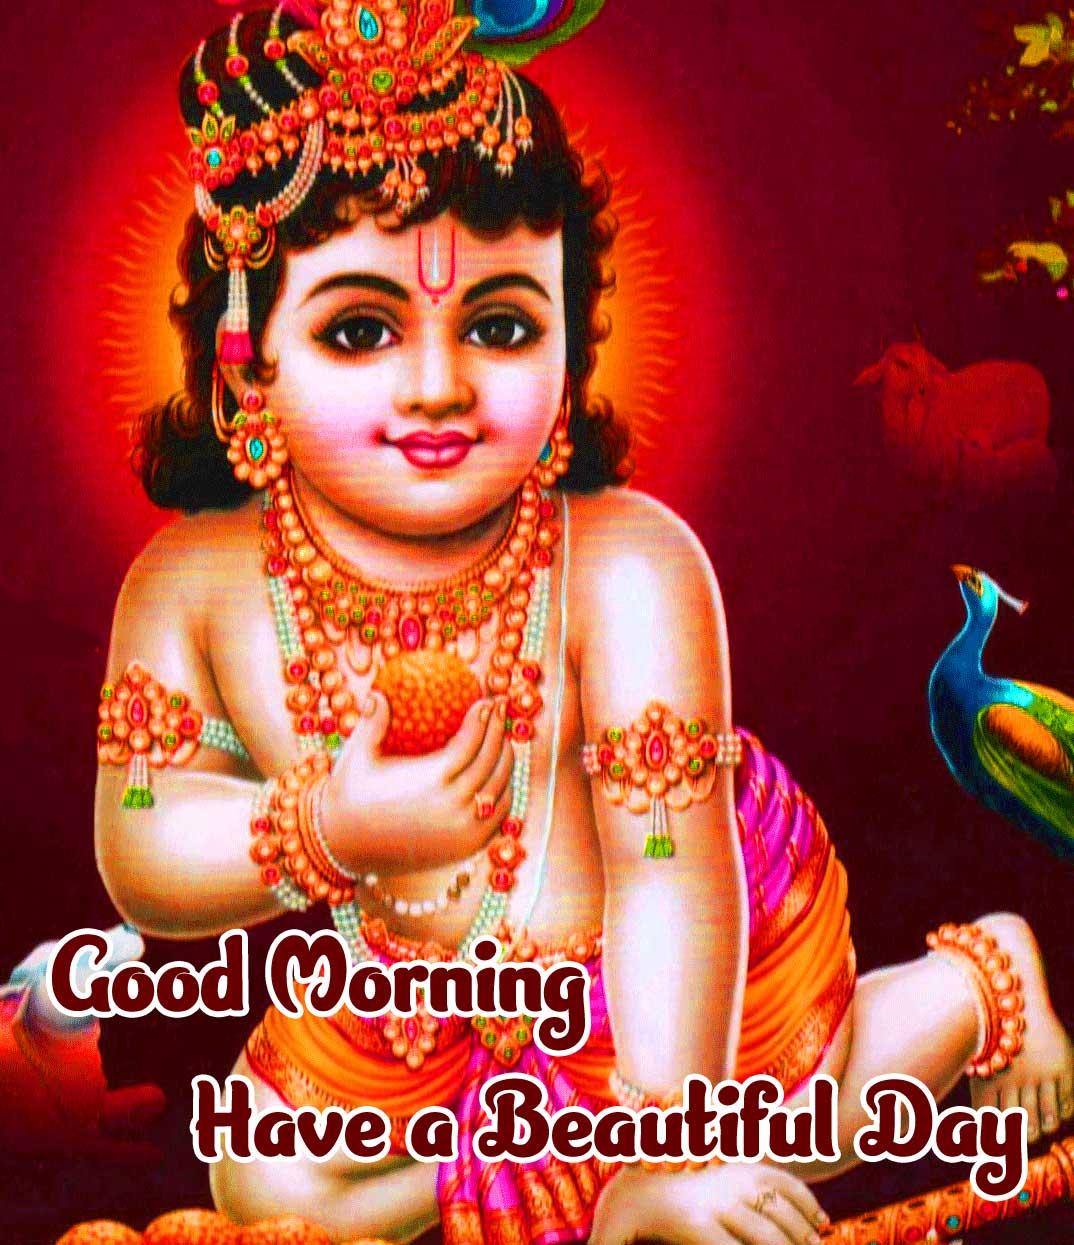 Krishna Amazing 1080 p Good Morning 4k ImagesPics Download